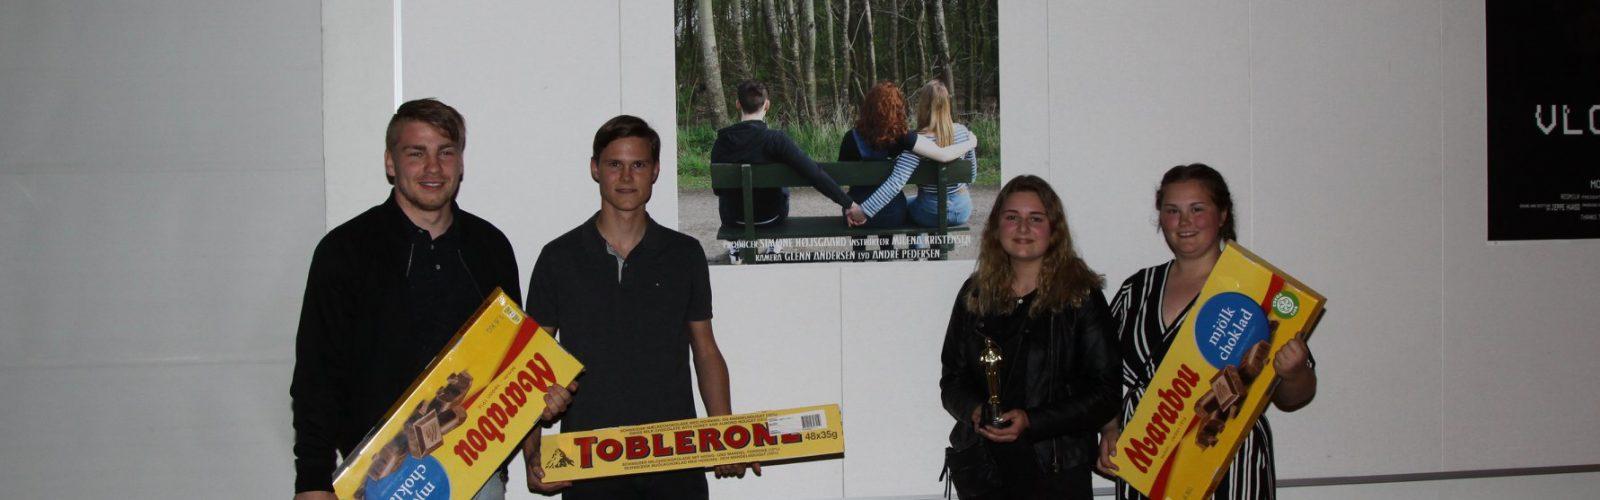 Hammerich Filmfestival